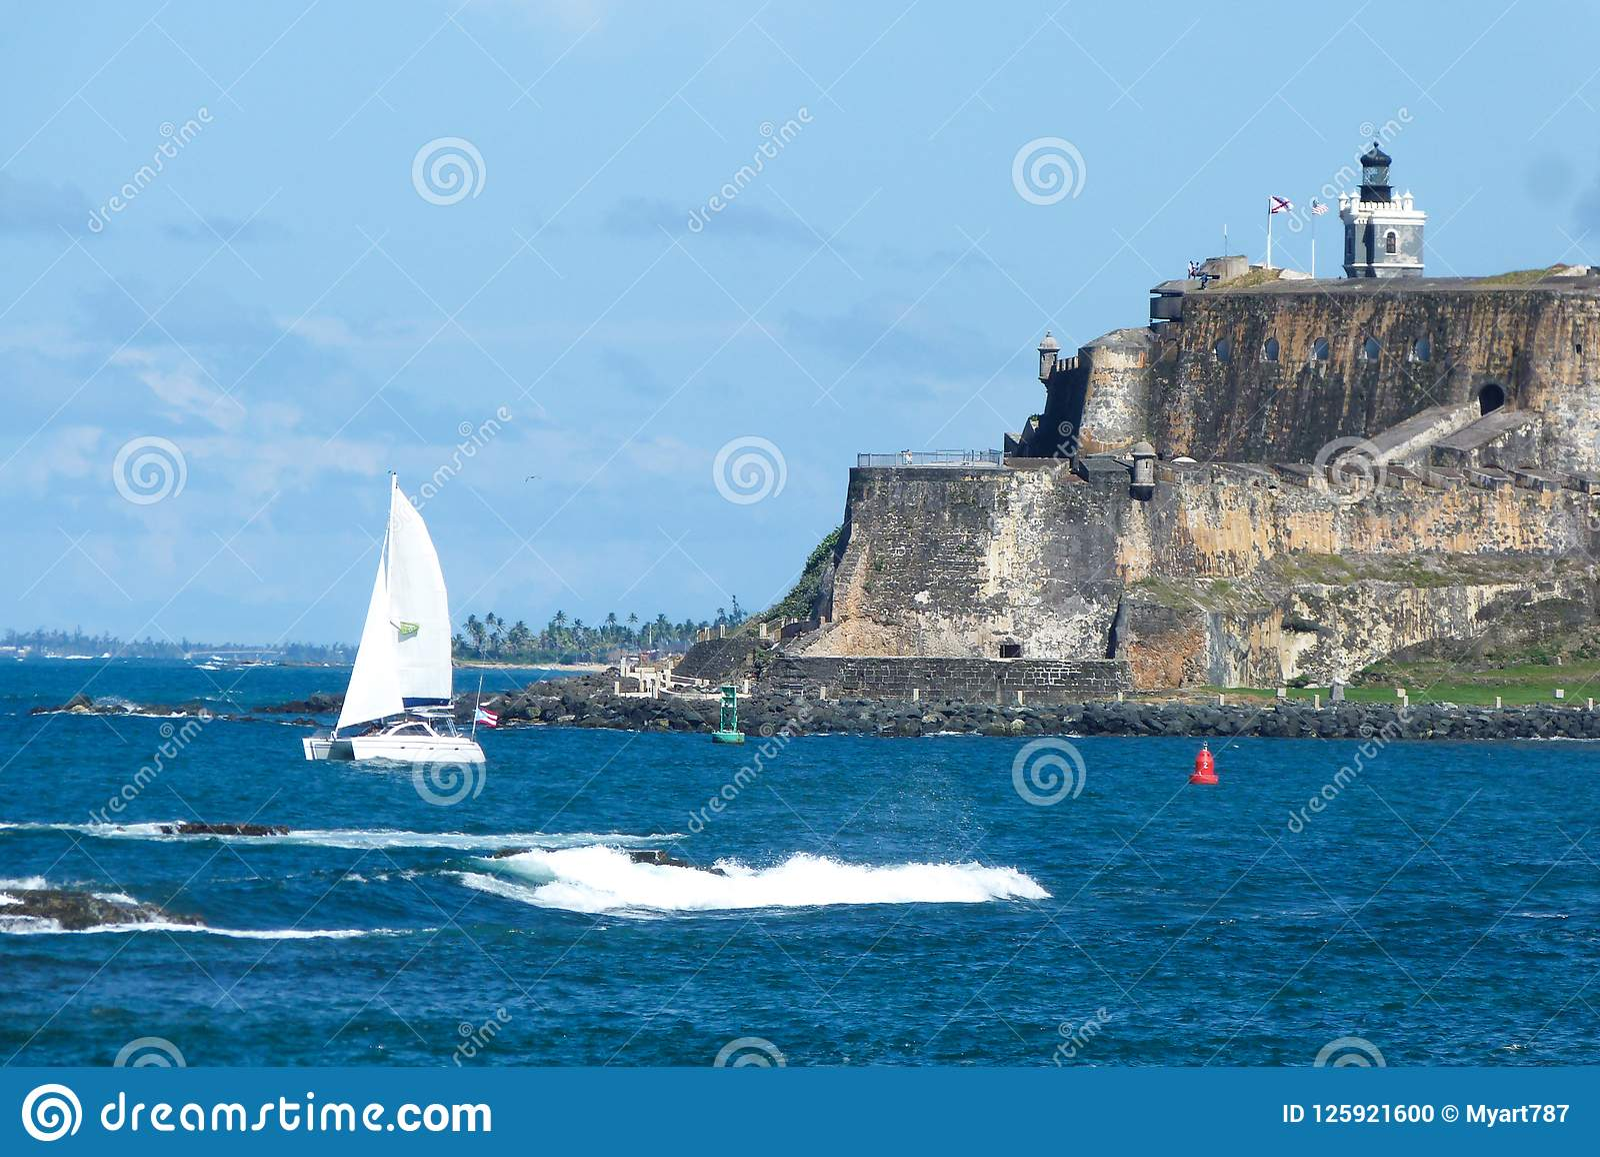 Sailboat in front of El Morro Castle